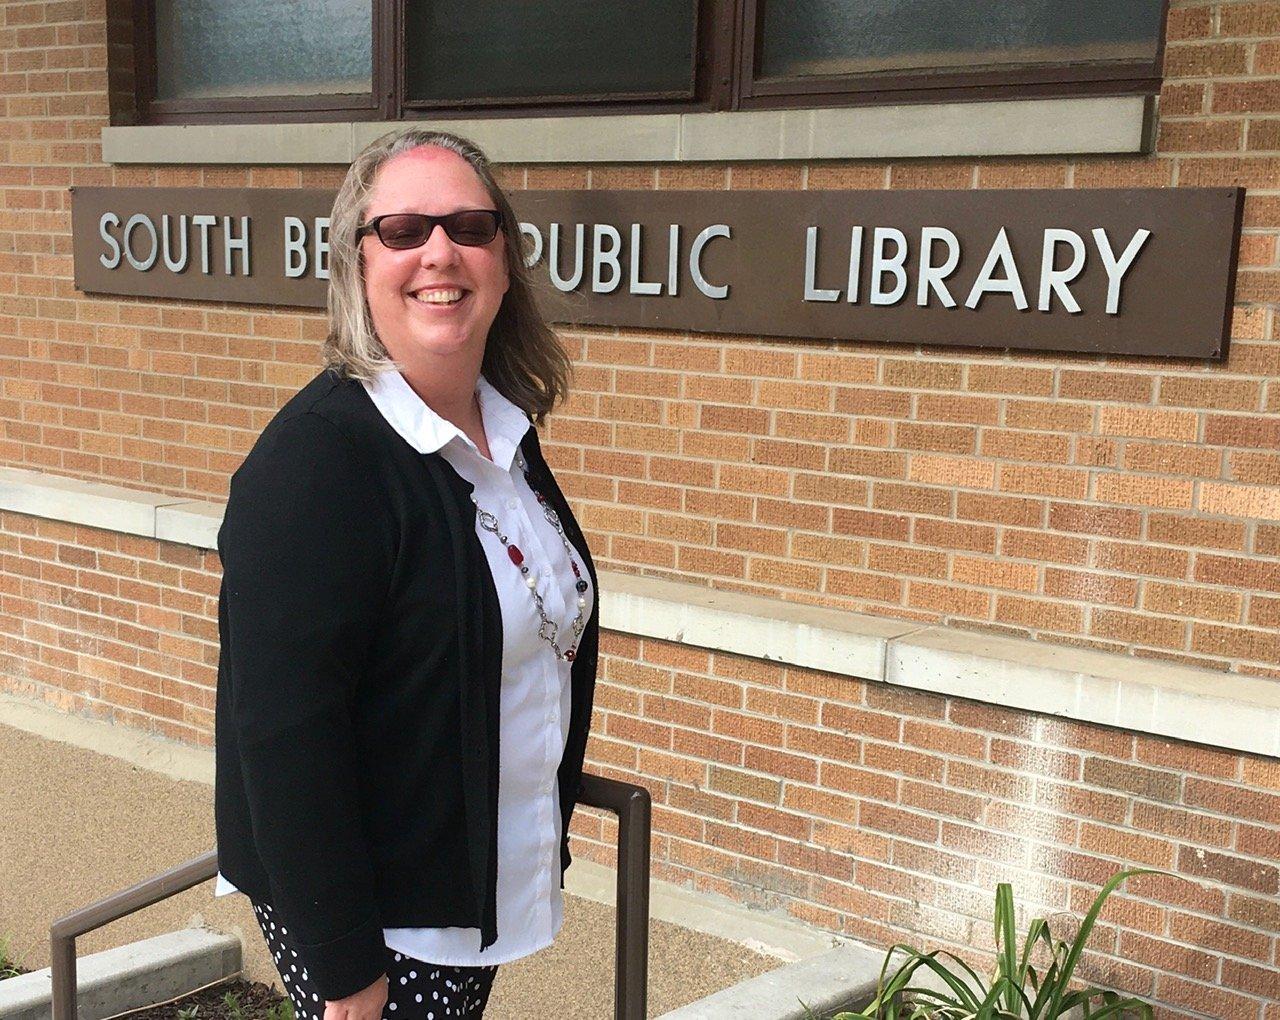 Brenda Weinberg, Library Director